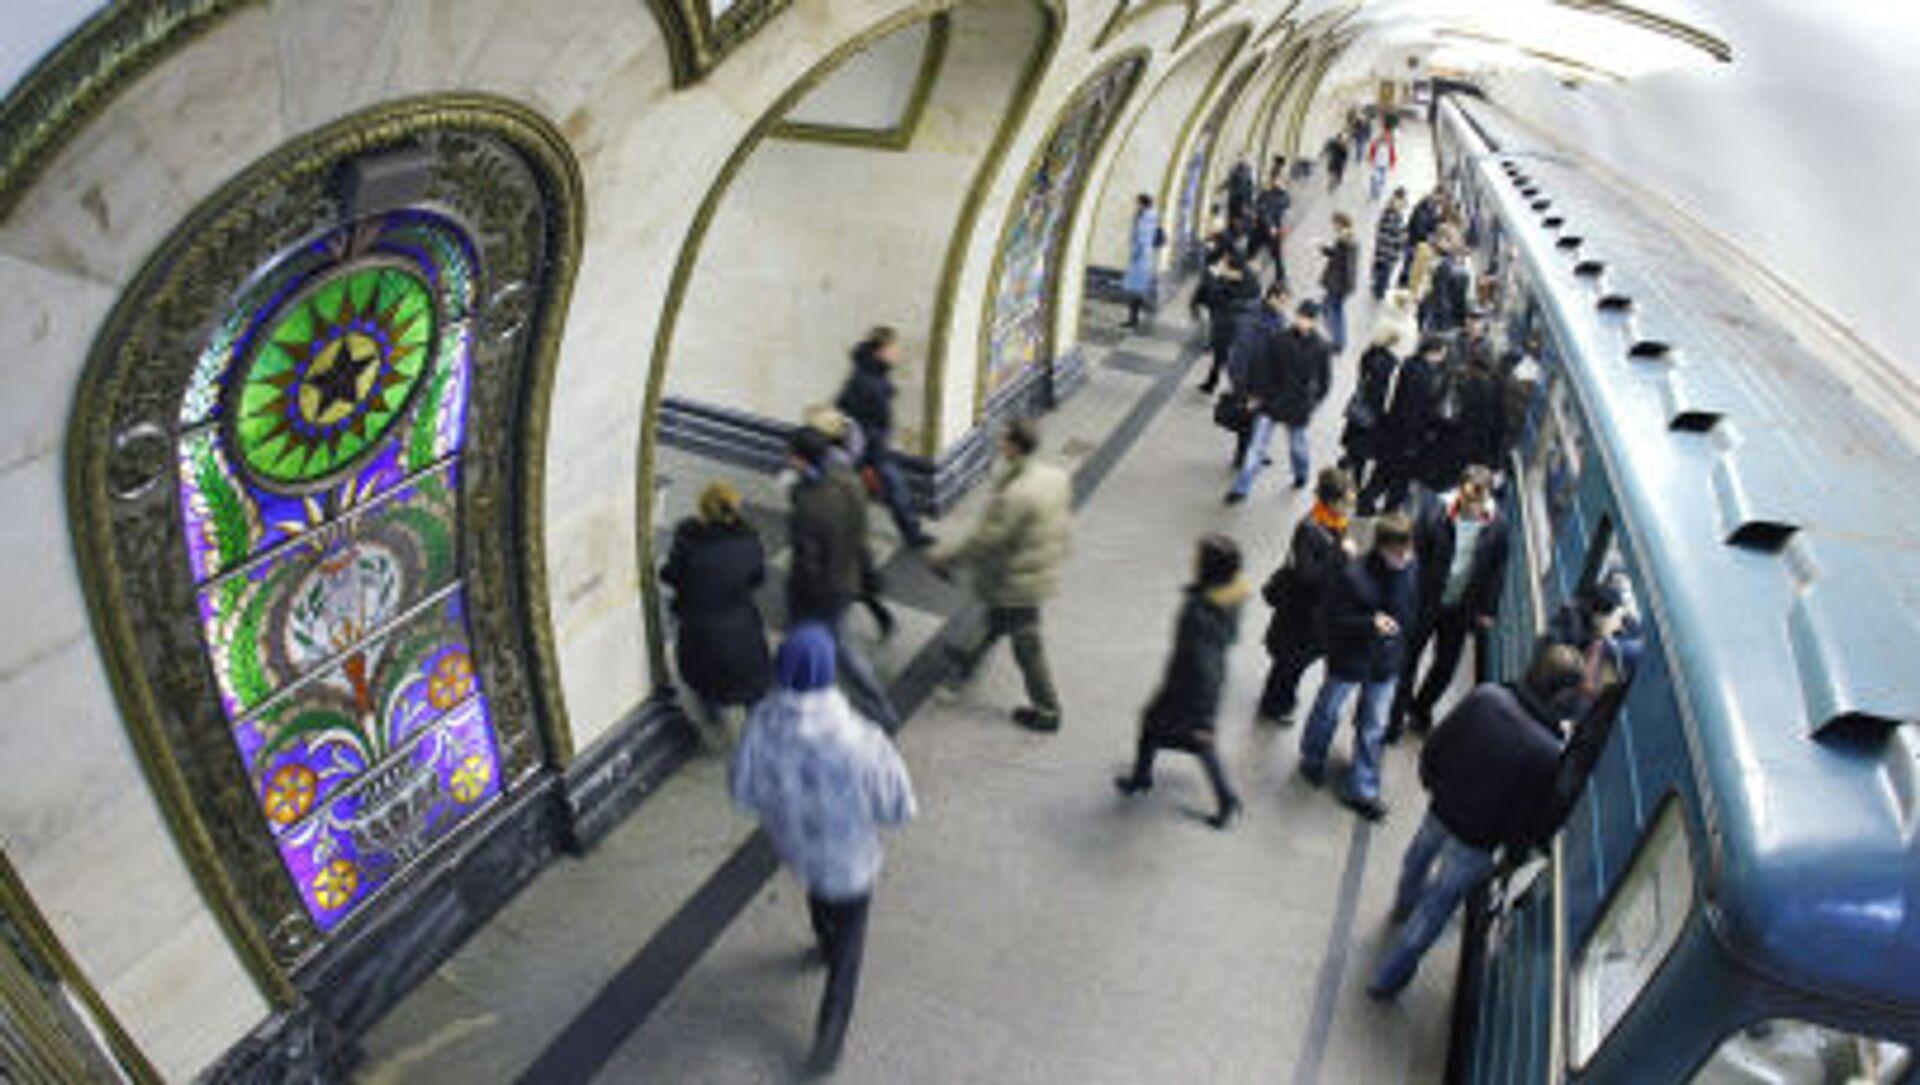 Mosca, la stazione della Metro Novoslobodskaya - Sputnik Italia, 1920, 04.04.2021